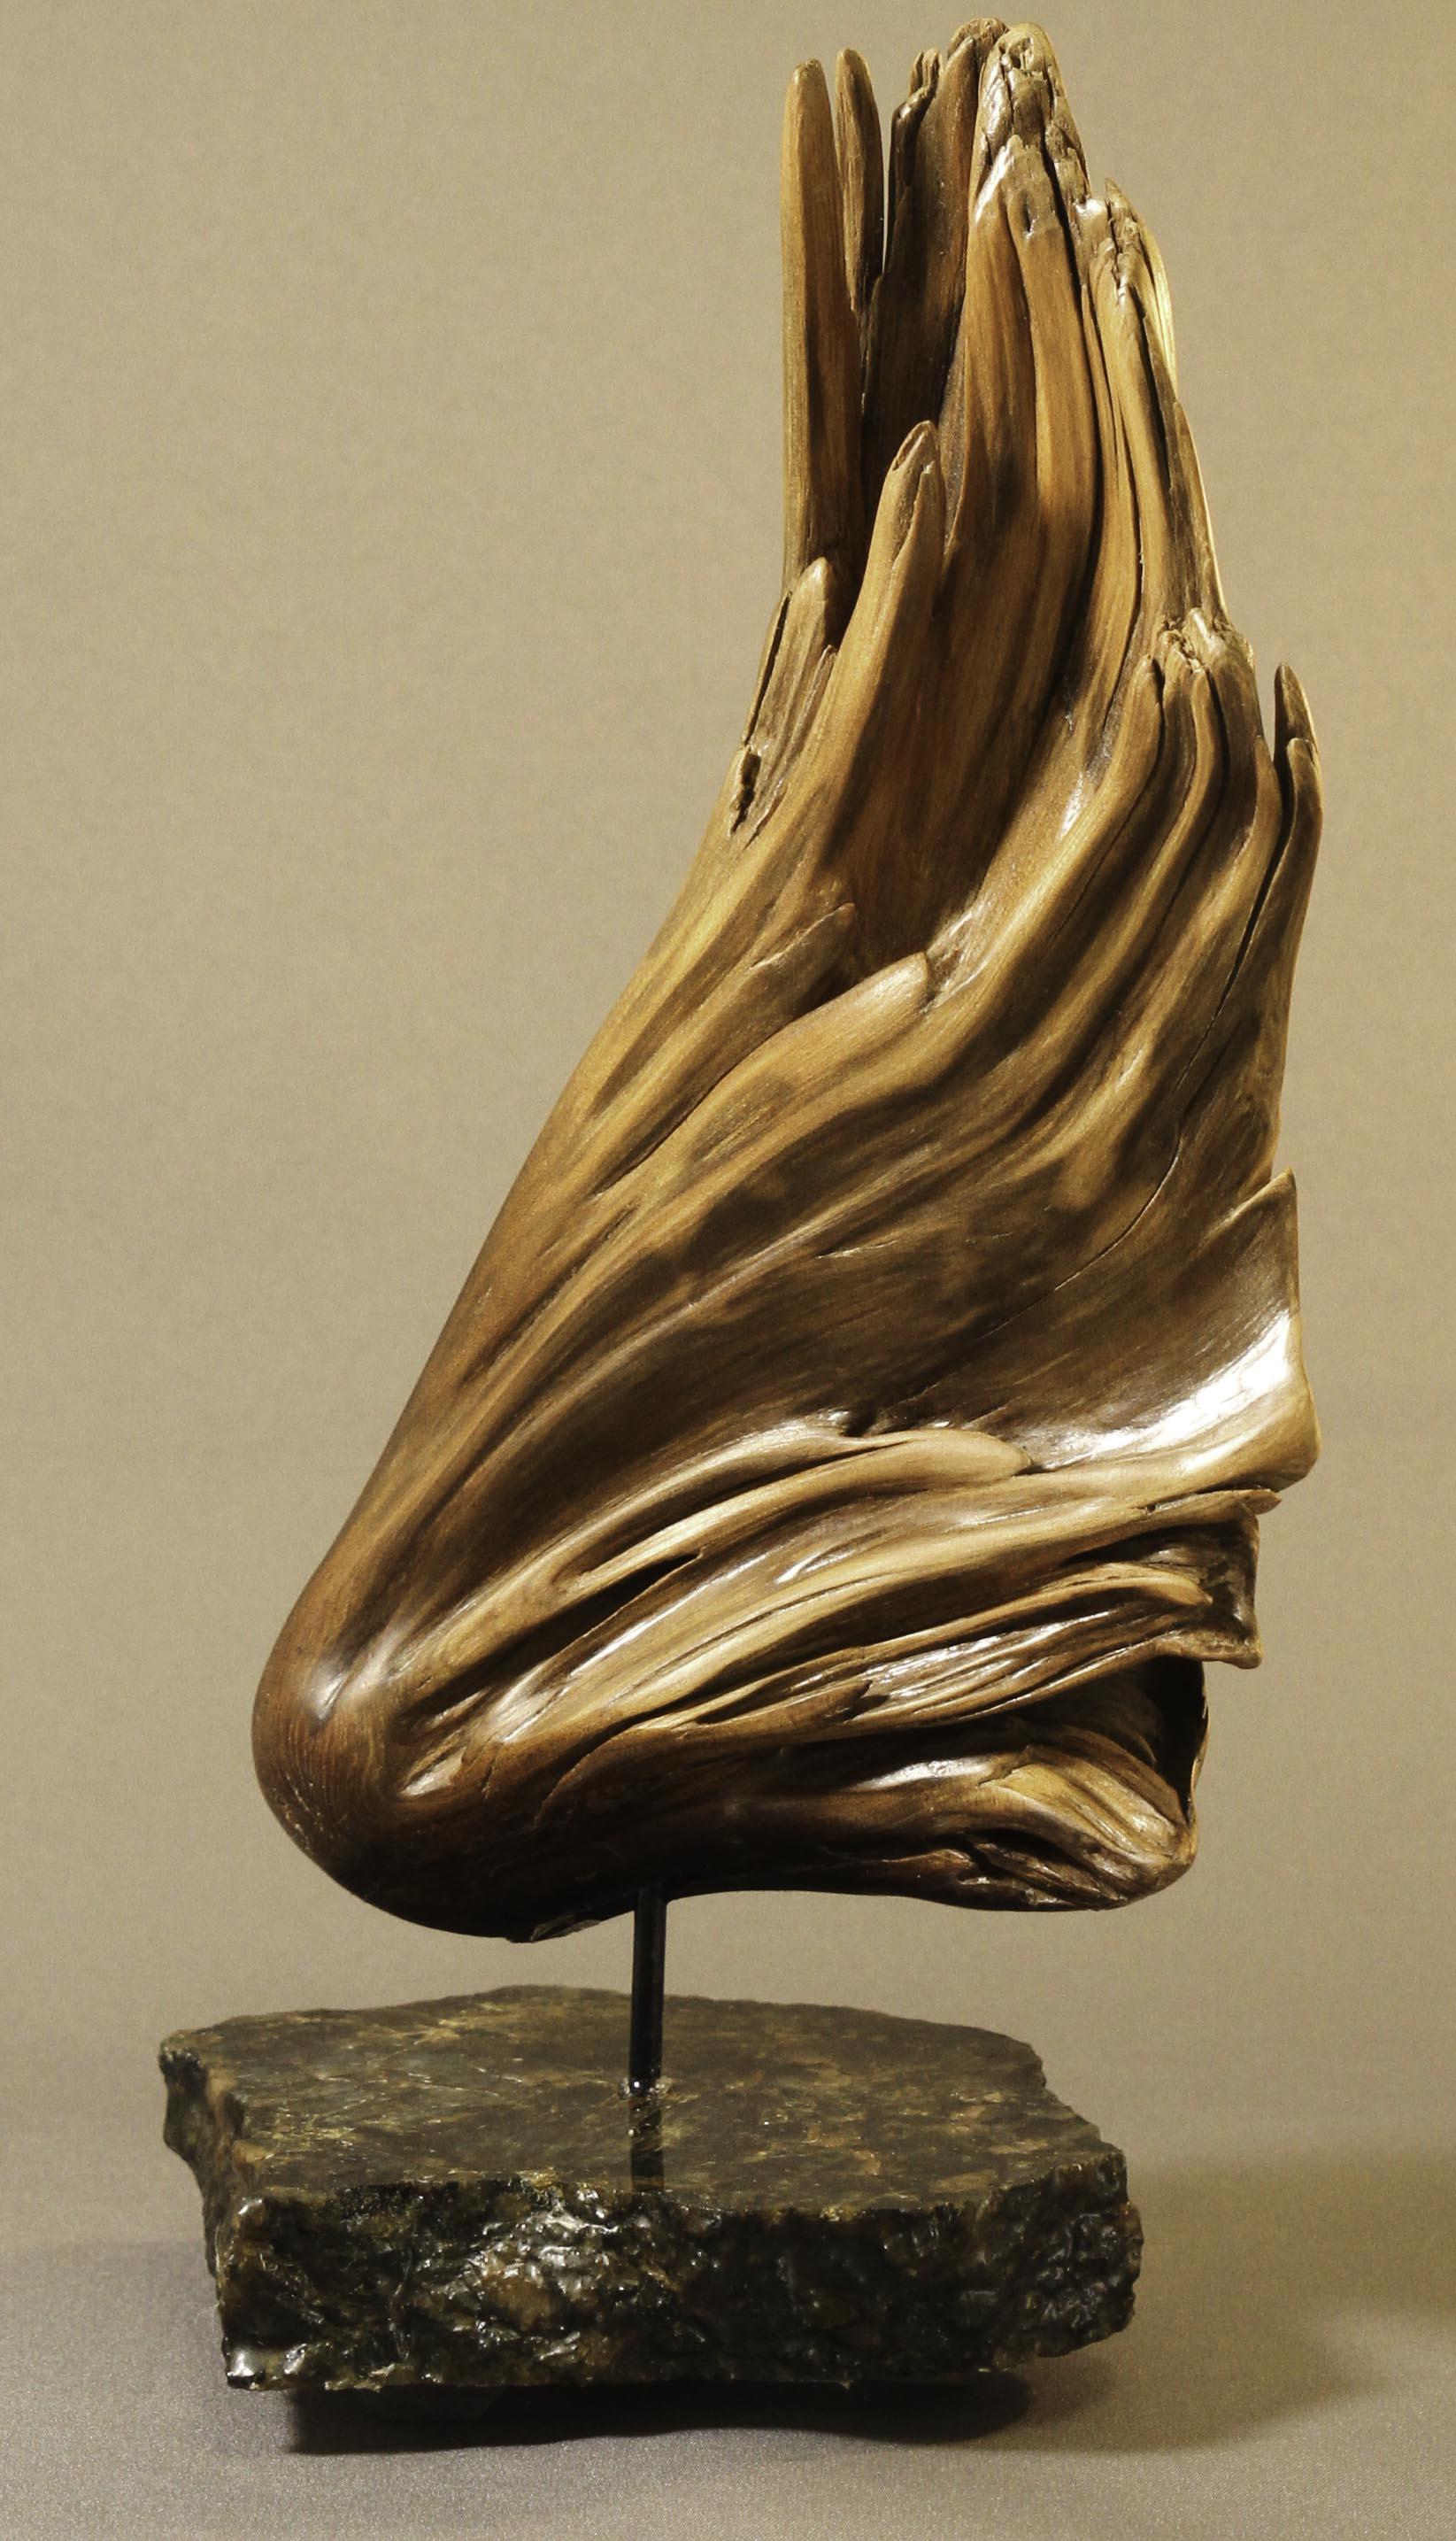 Little Brown Bird by Joan Masterson